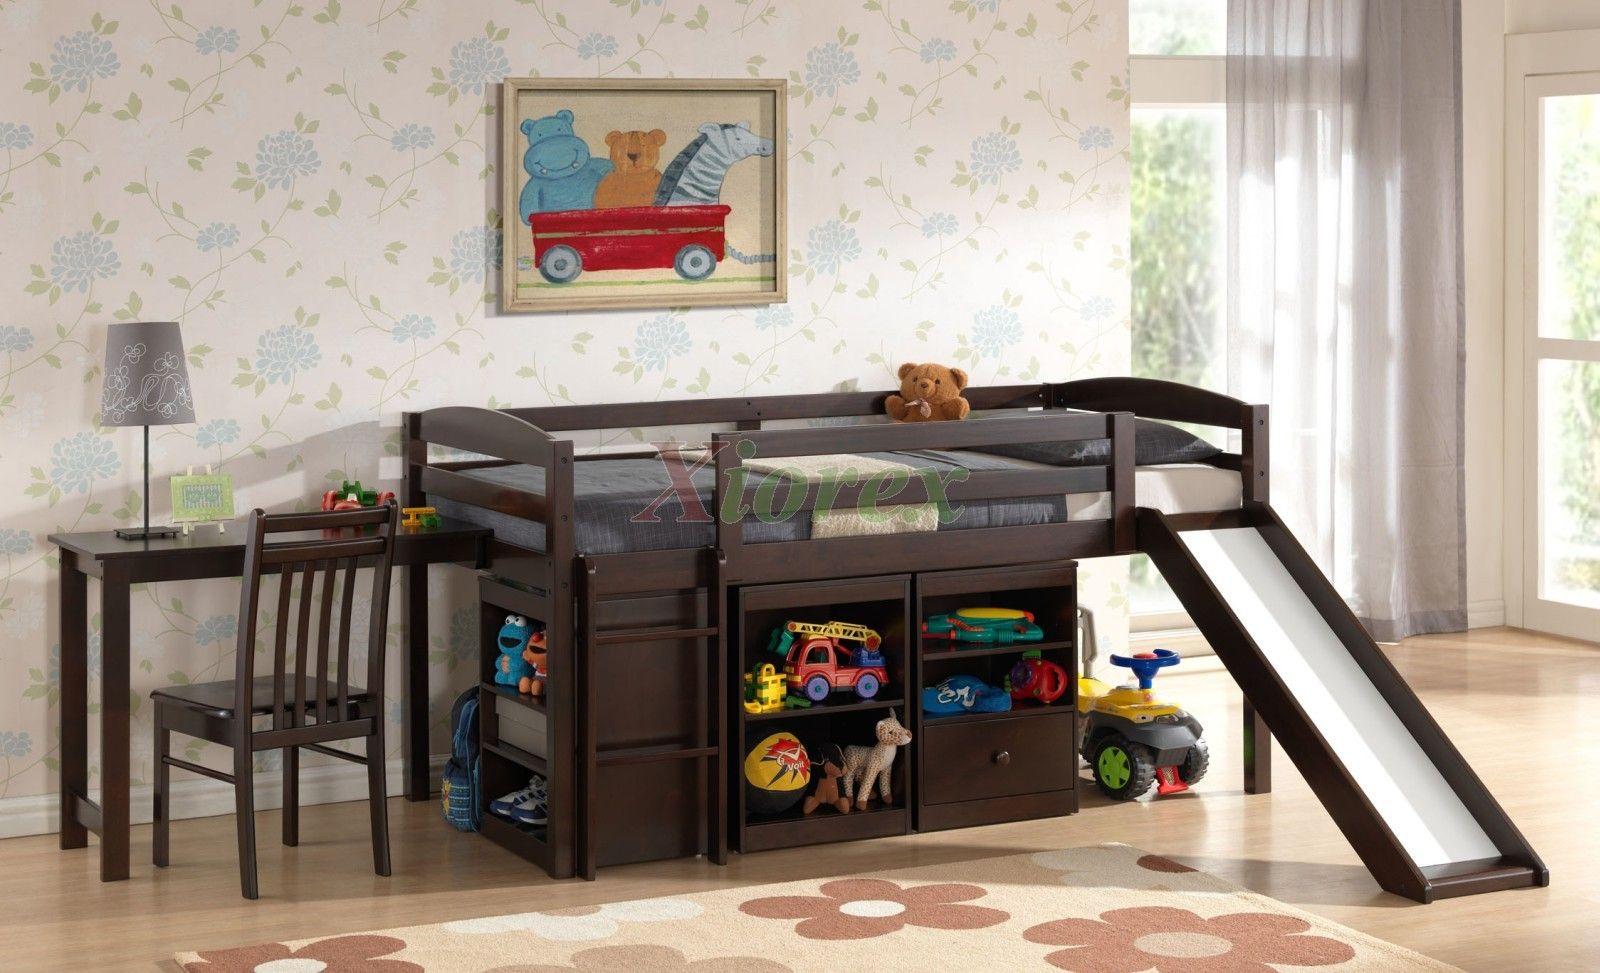 Bunk beds with slide for teenage girls - Mulberry Boys Girls Cabin Loft Beds With Slide Desk Storage